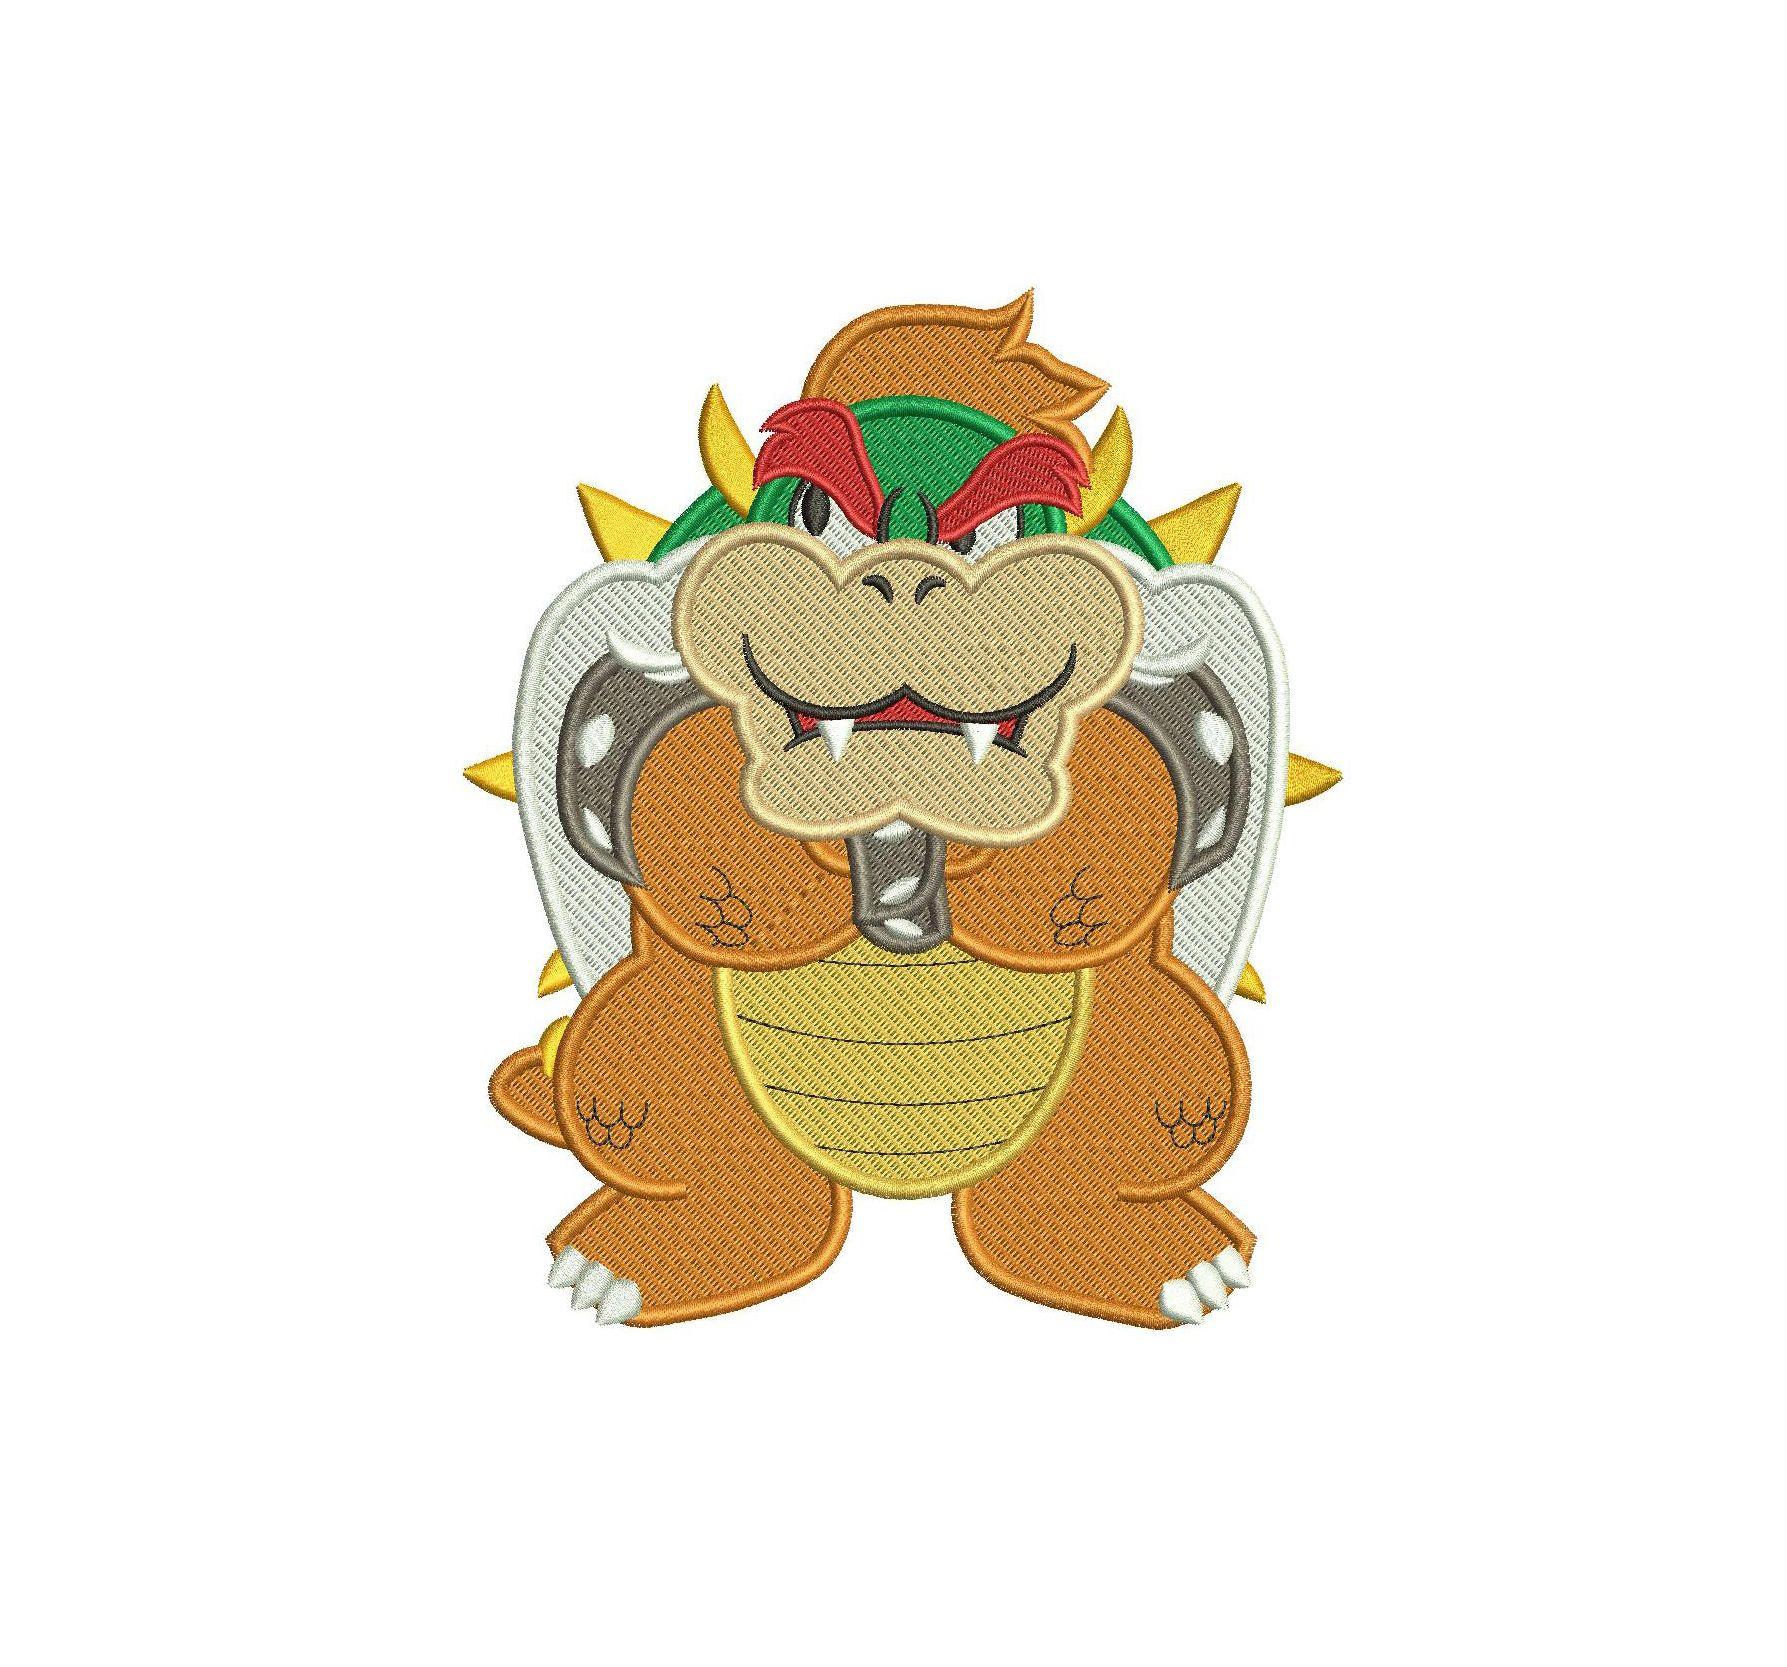 Bowser Super Mario Full Embroidery Design Embroidery Designs Applique Designs Super Mario